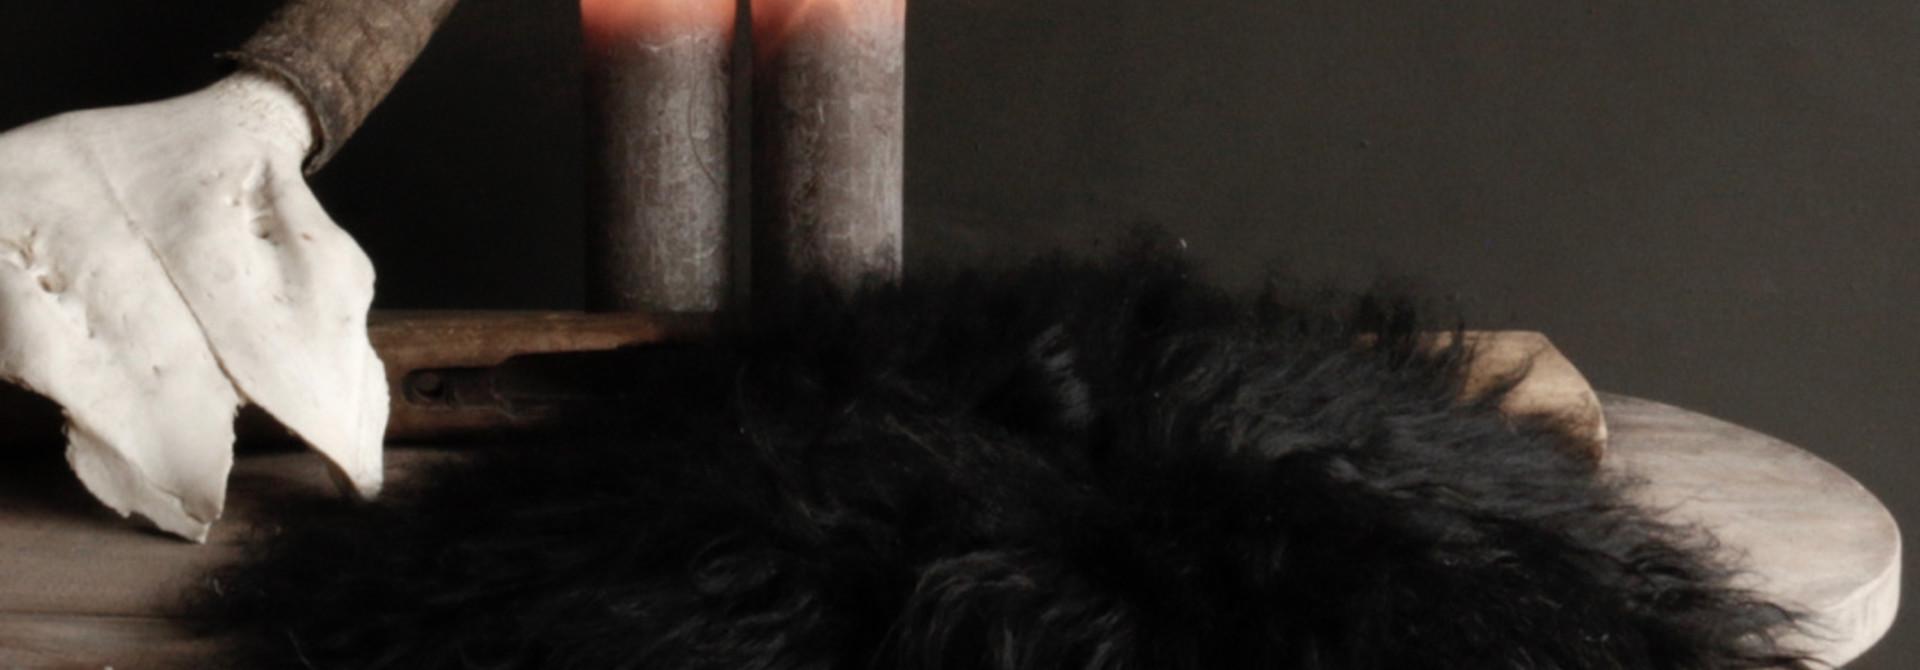 Rond schapen vachtje zwart/bruin